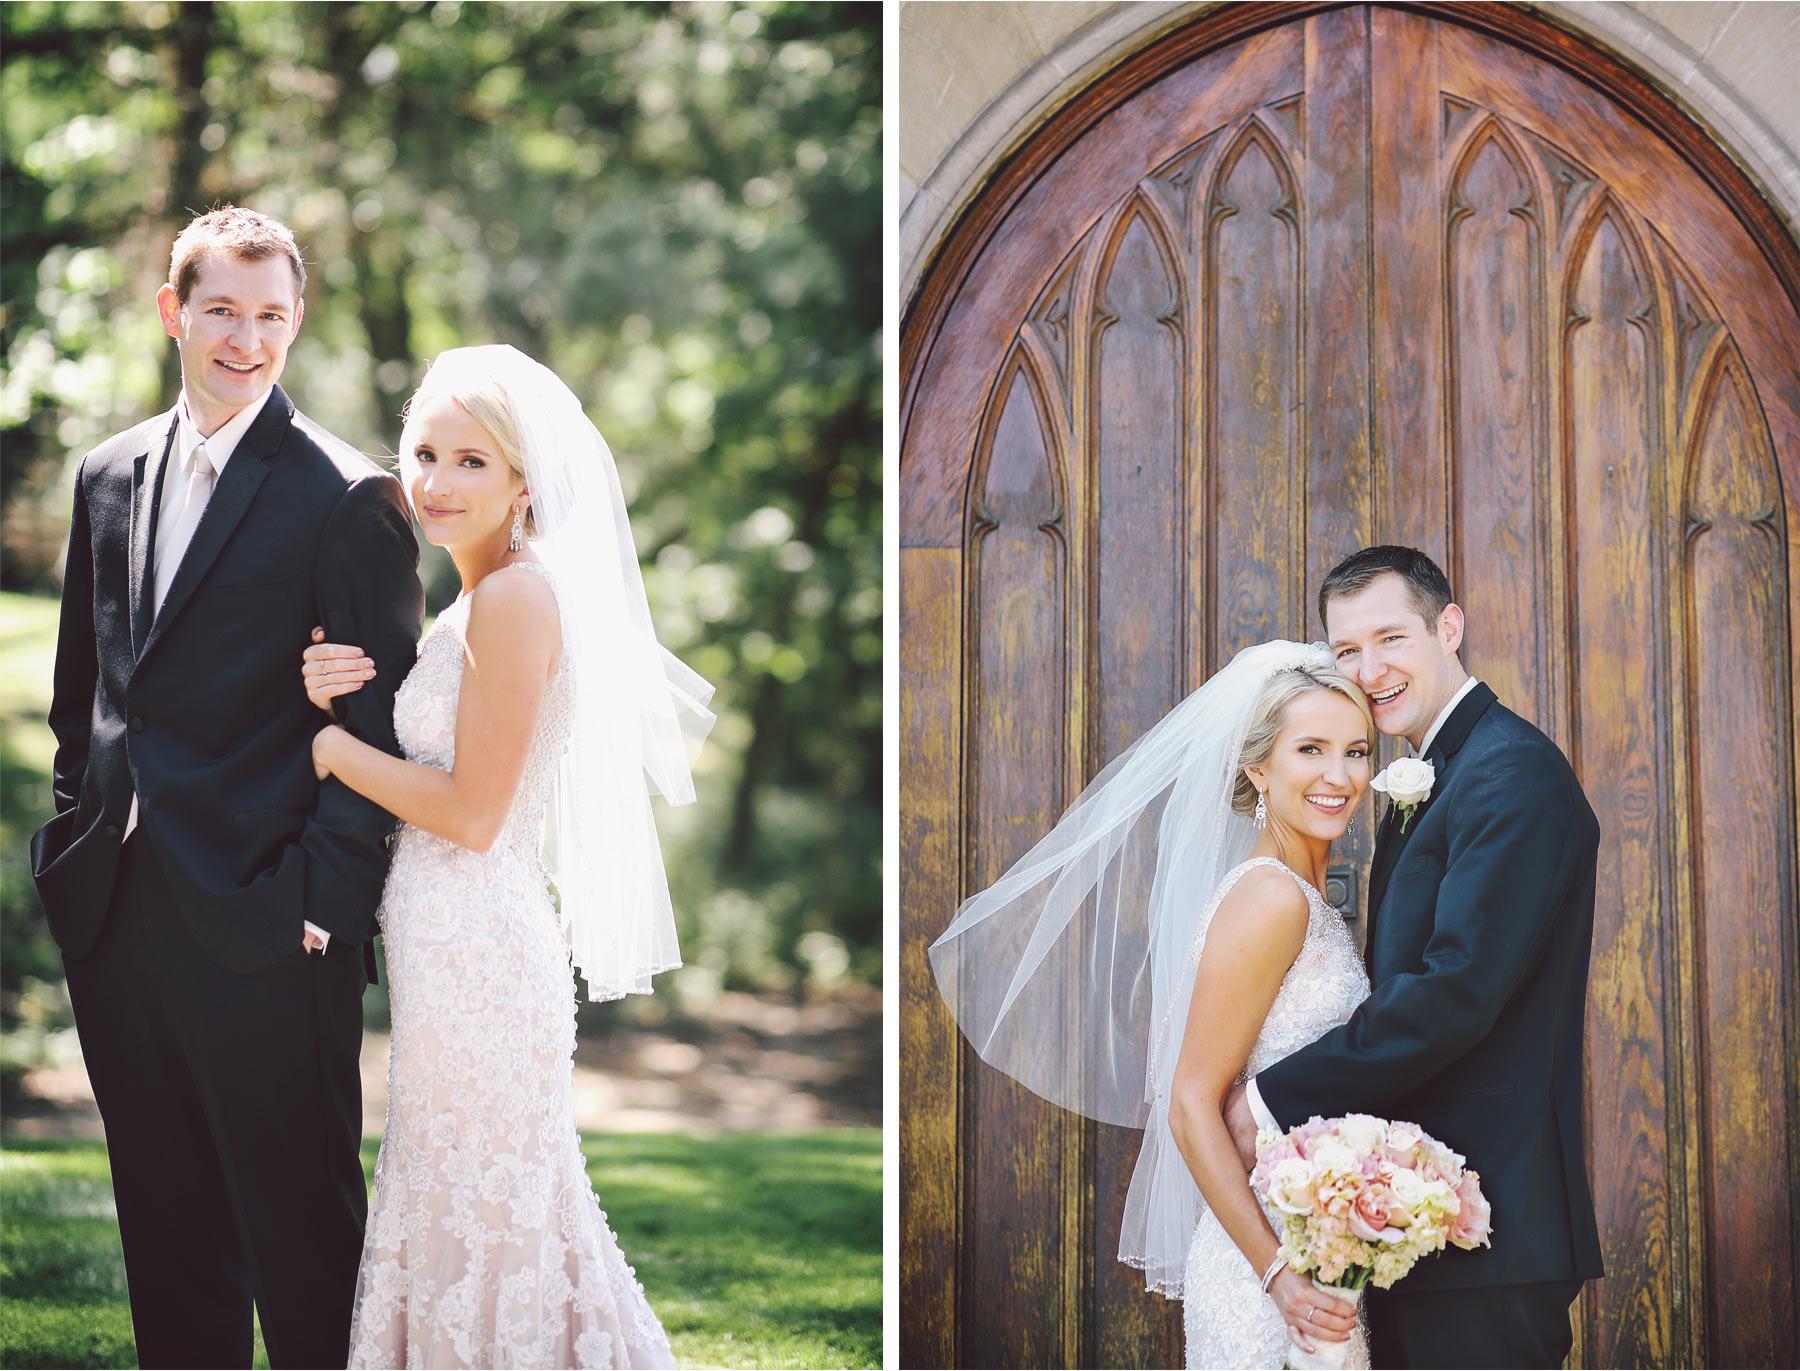 06-Minneapolis-Minnesota-Wedding-Photography-by-Vick-Photography-First-Look-Jenna-and-Josh.jpg